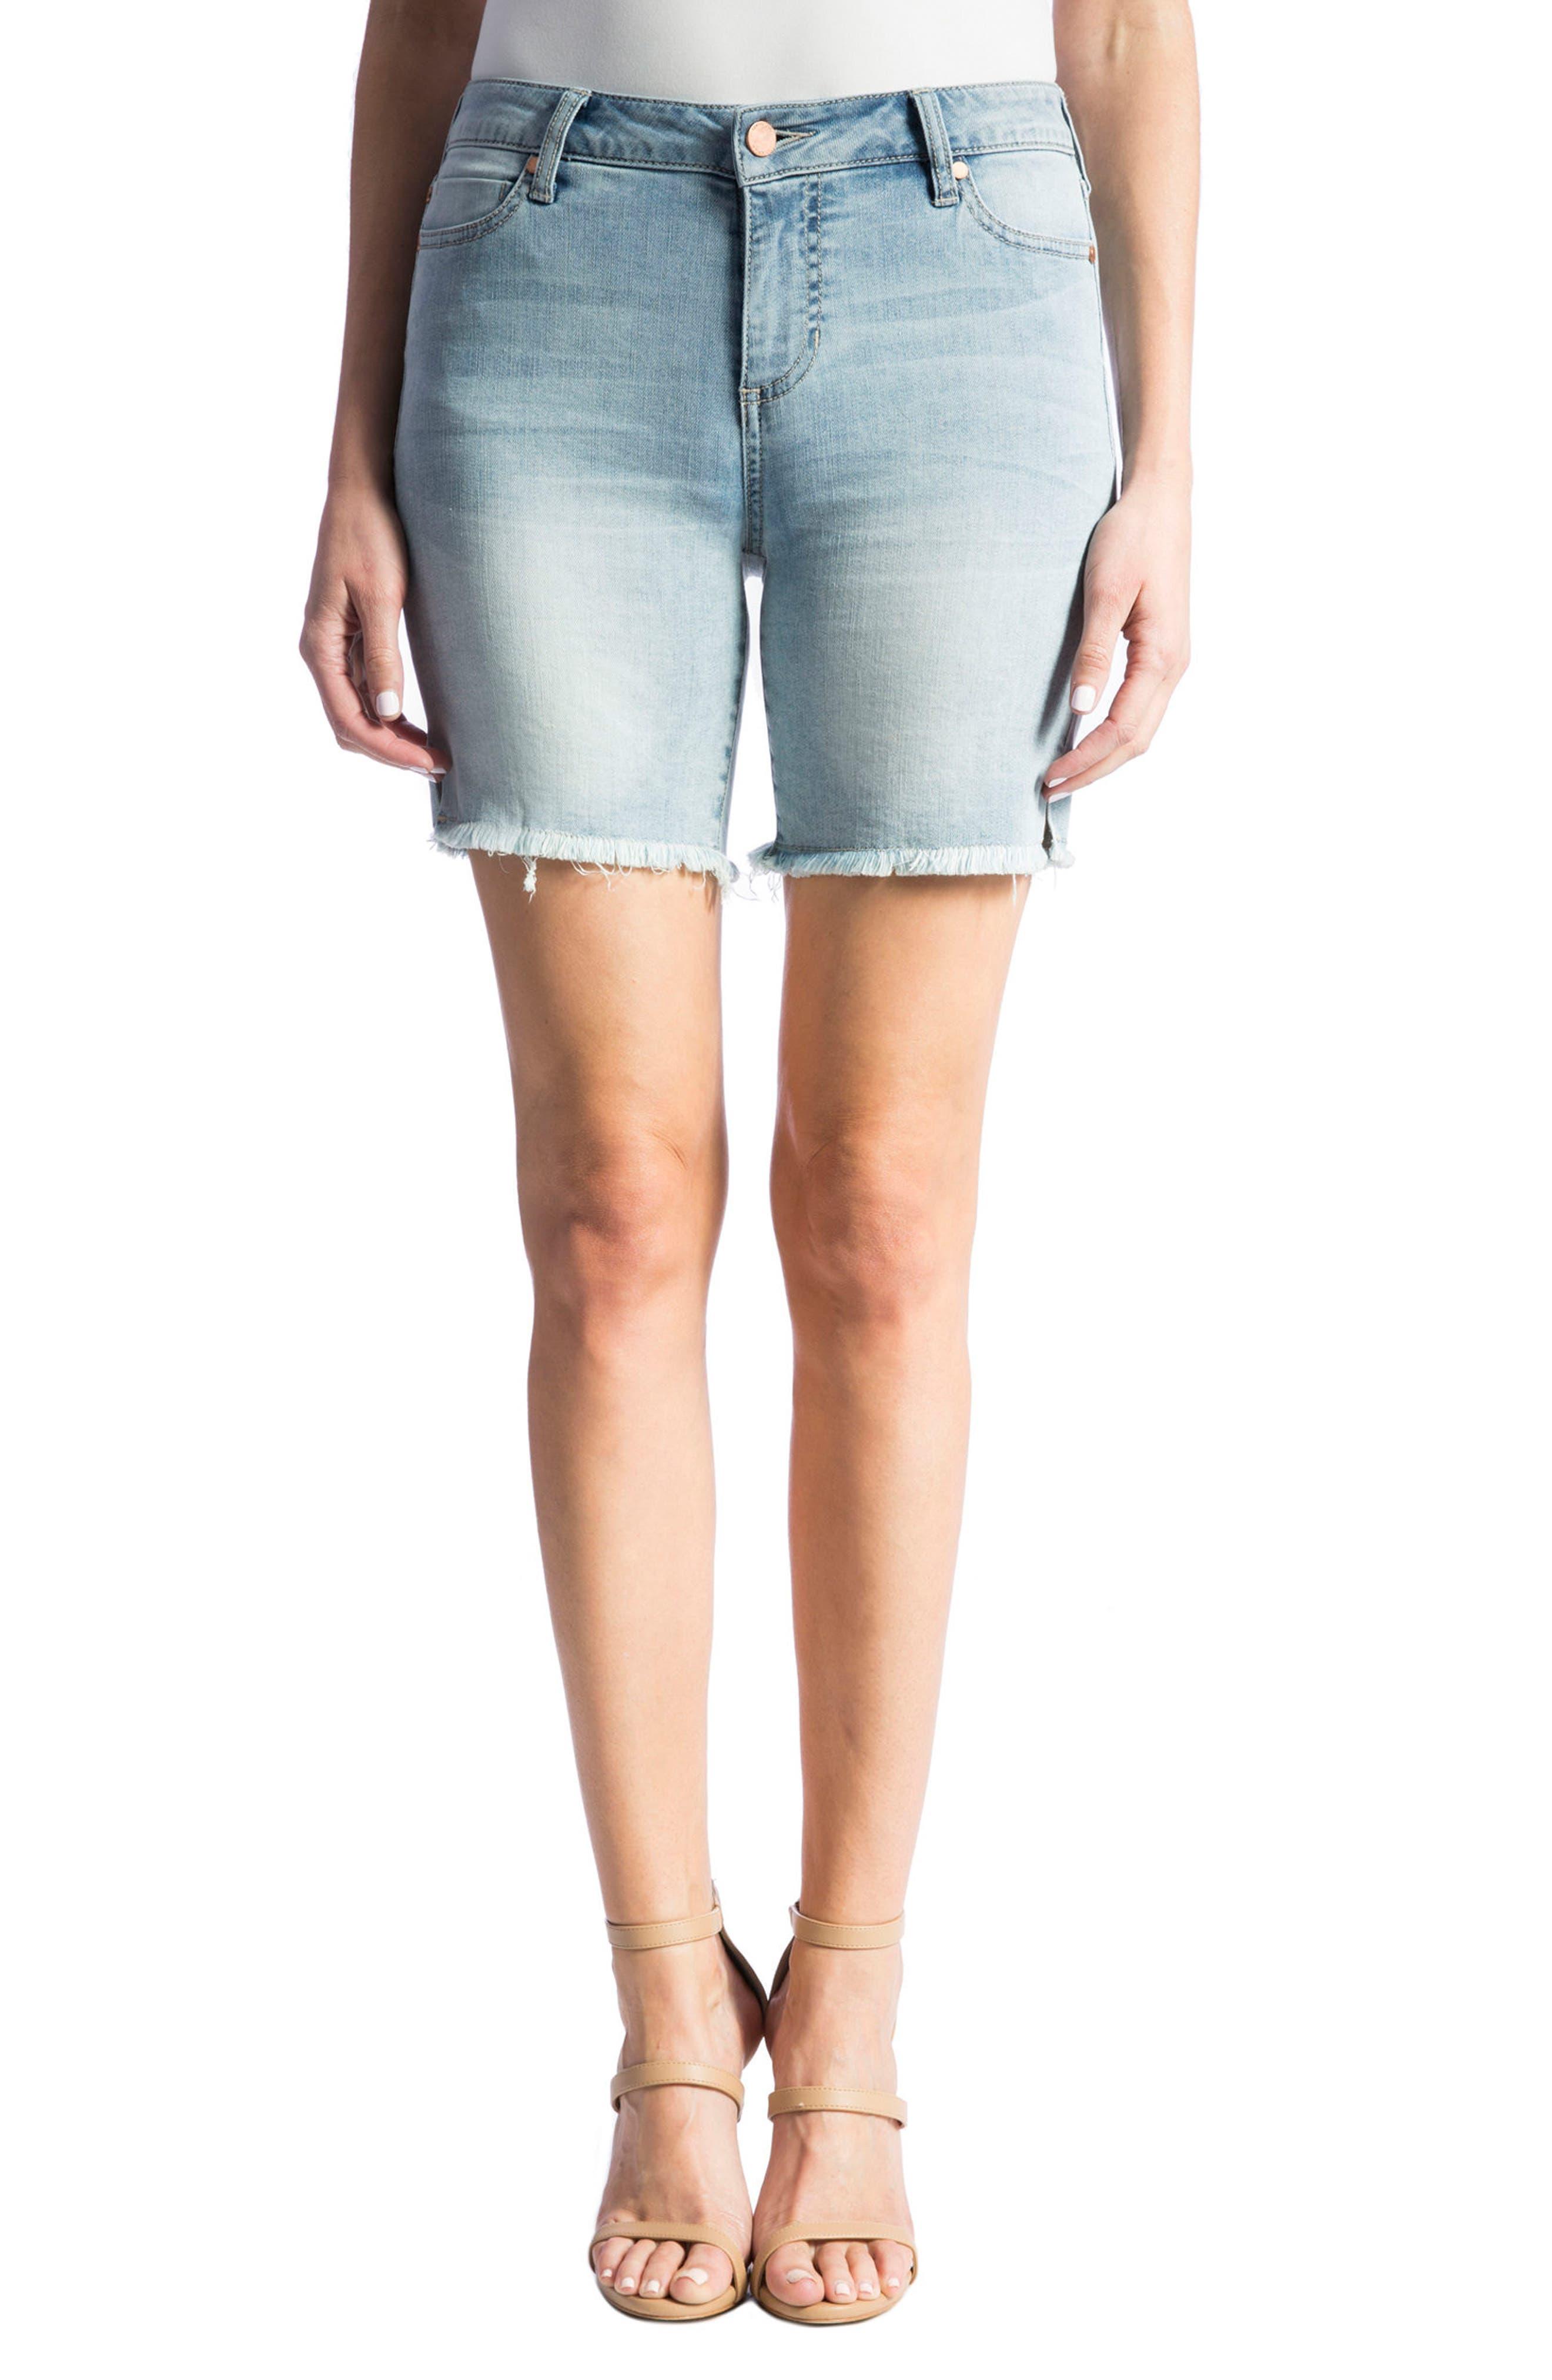 Liverpool Jeans Company Corine Denim Shorts